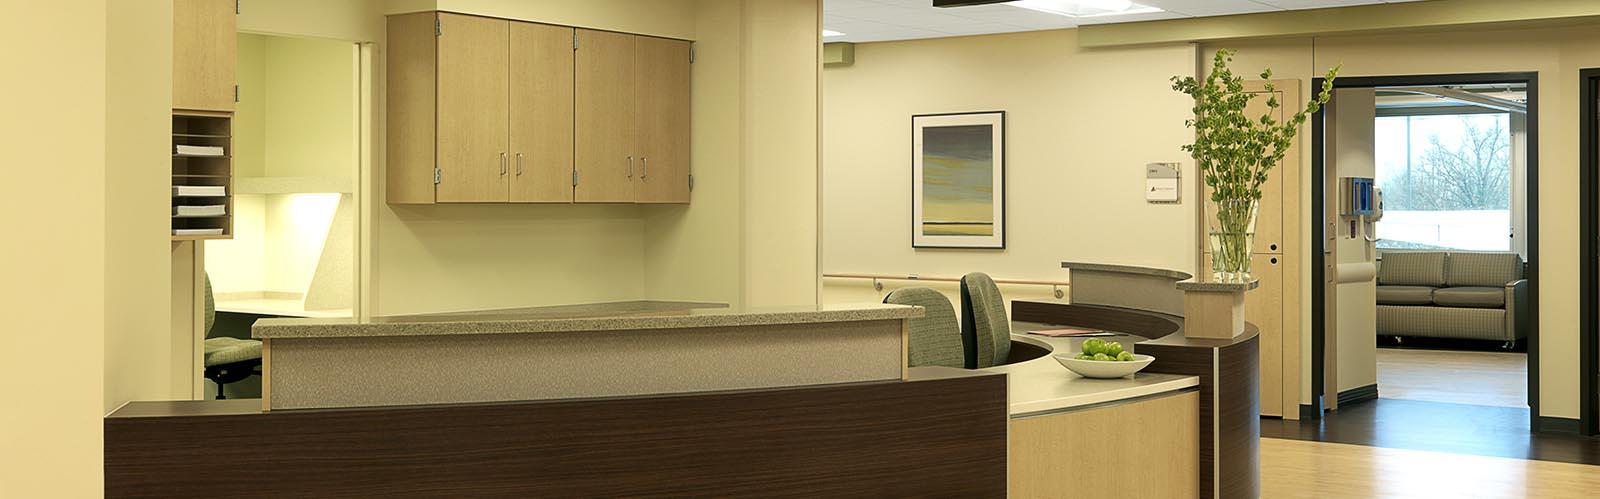 Western Missouri Medical Center Patient Tower 4